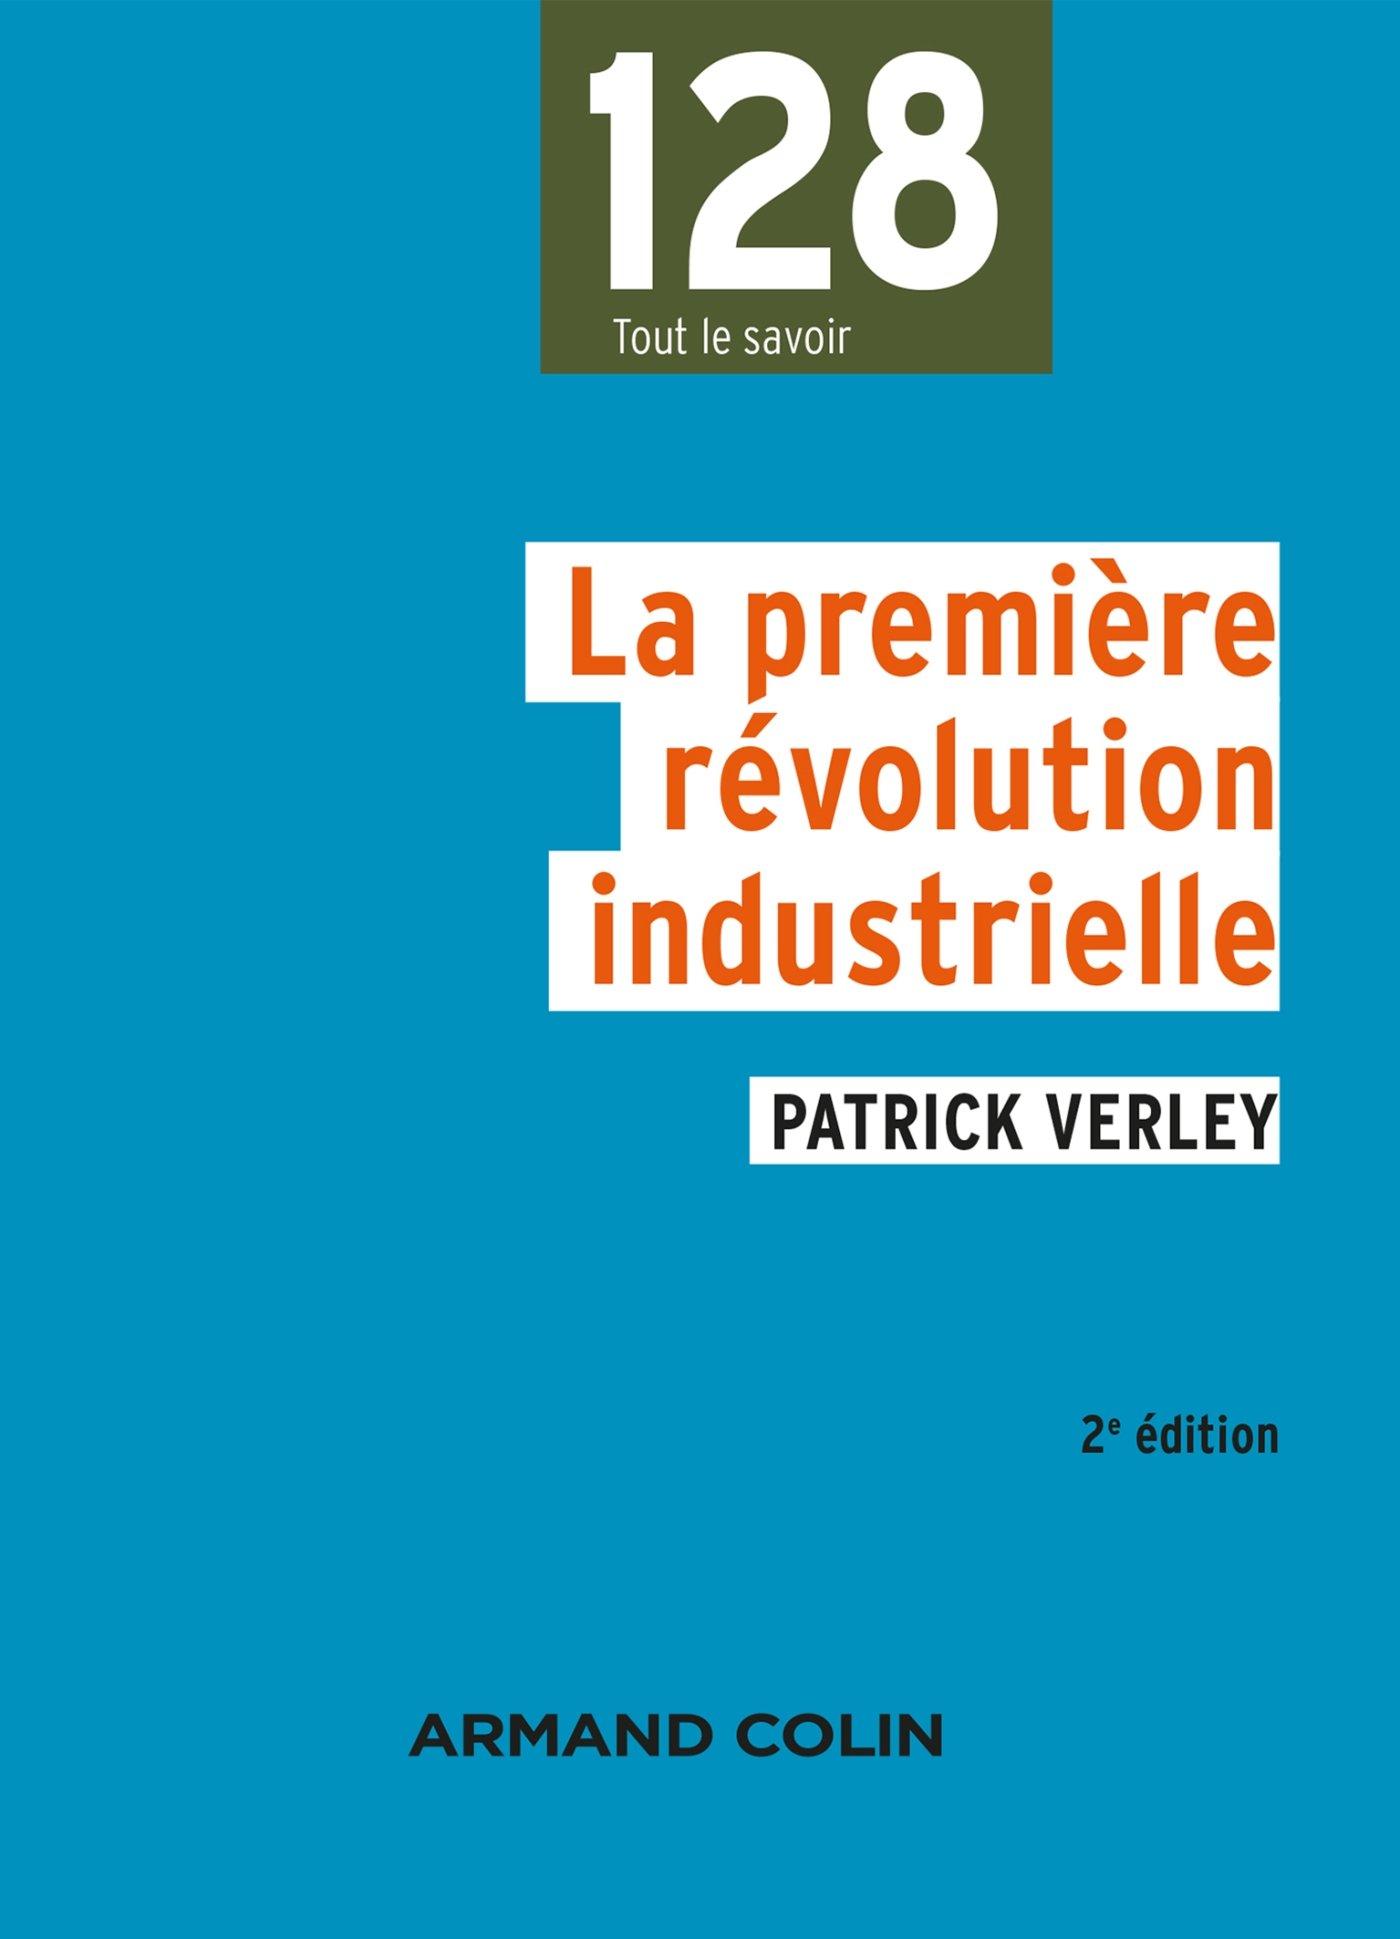 Resume de la premiere revolution industrielle sample resume it business analyst